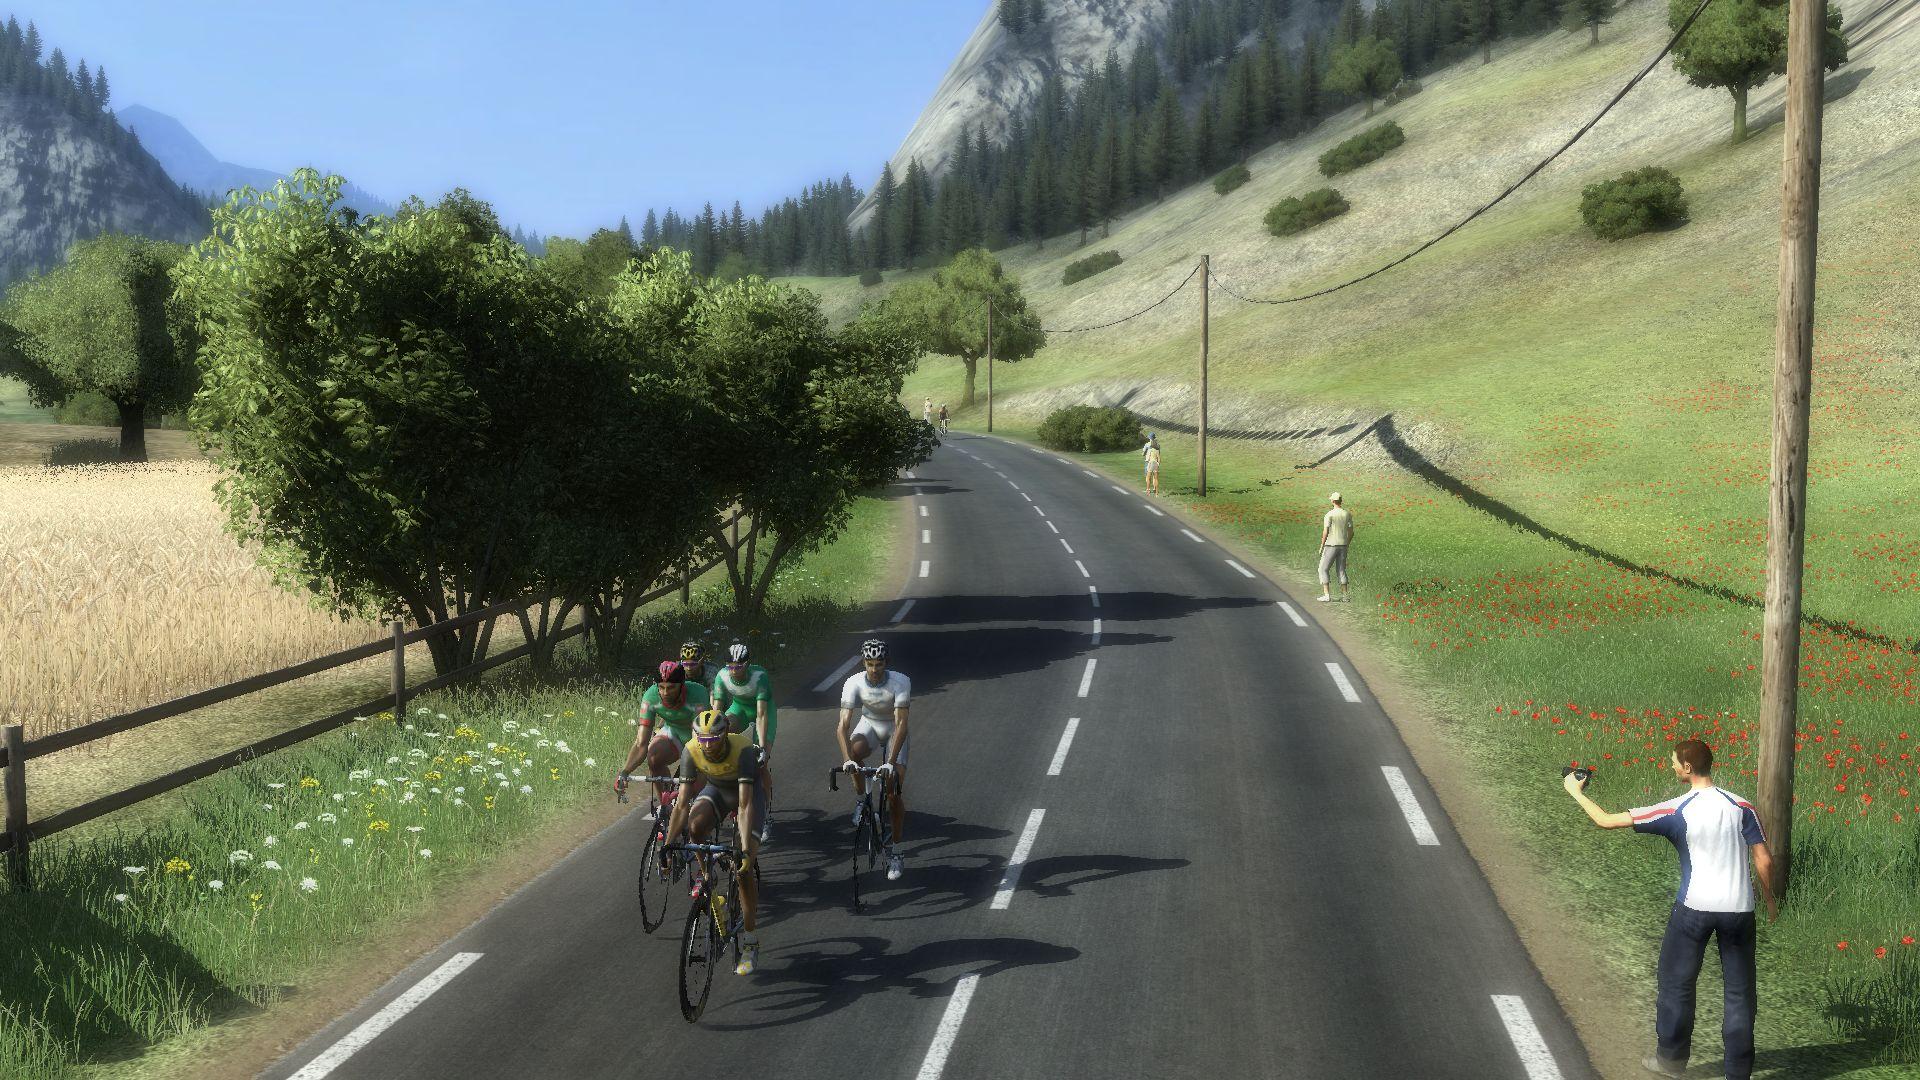 pcmdaily.com/images/mg/2017/Races/U23/Avenir/AVES7%2015.jpg